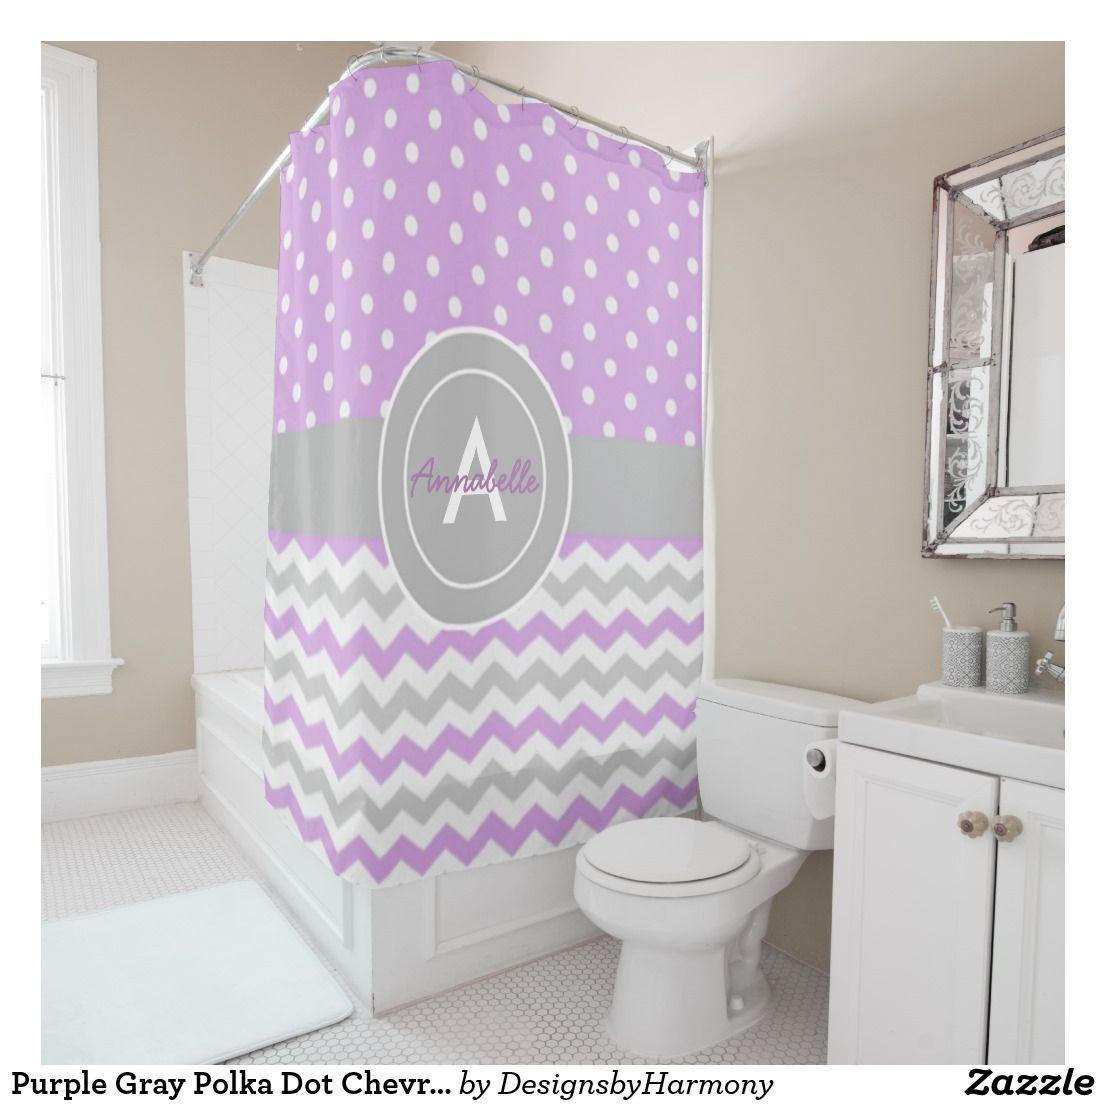 Purple polka dot curtains - Purple Gray Polka Dot Chevron Shower Curtain